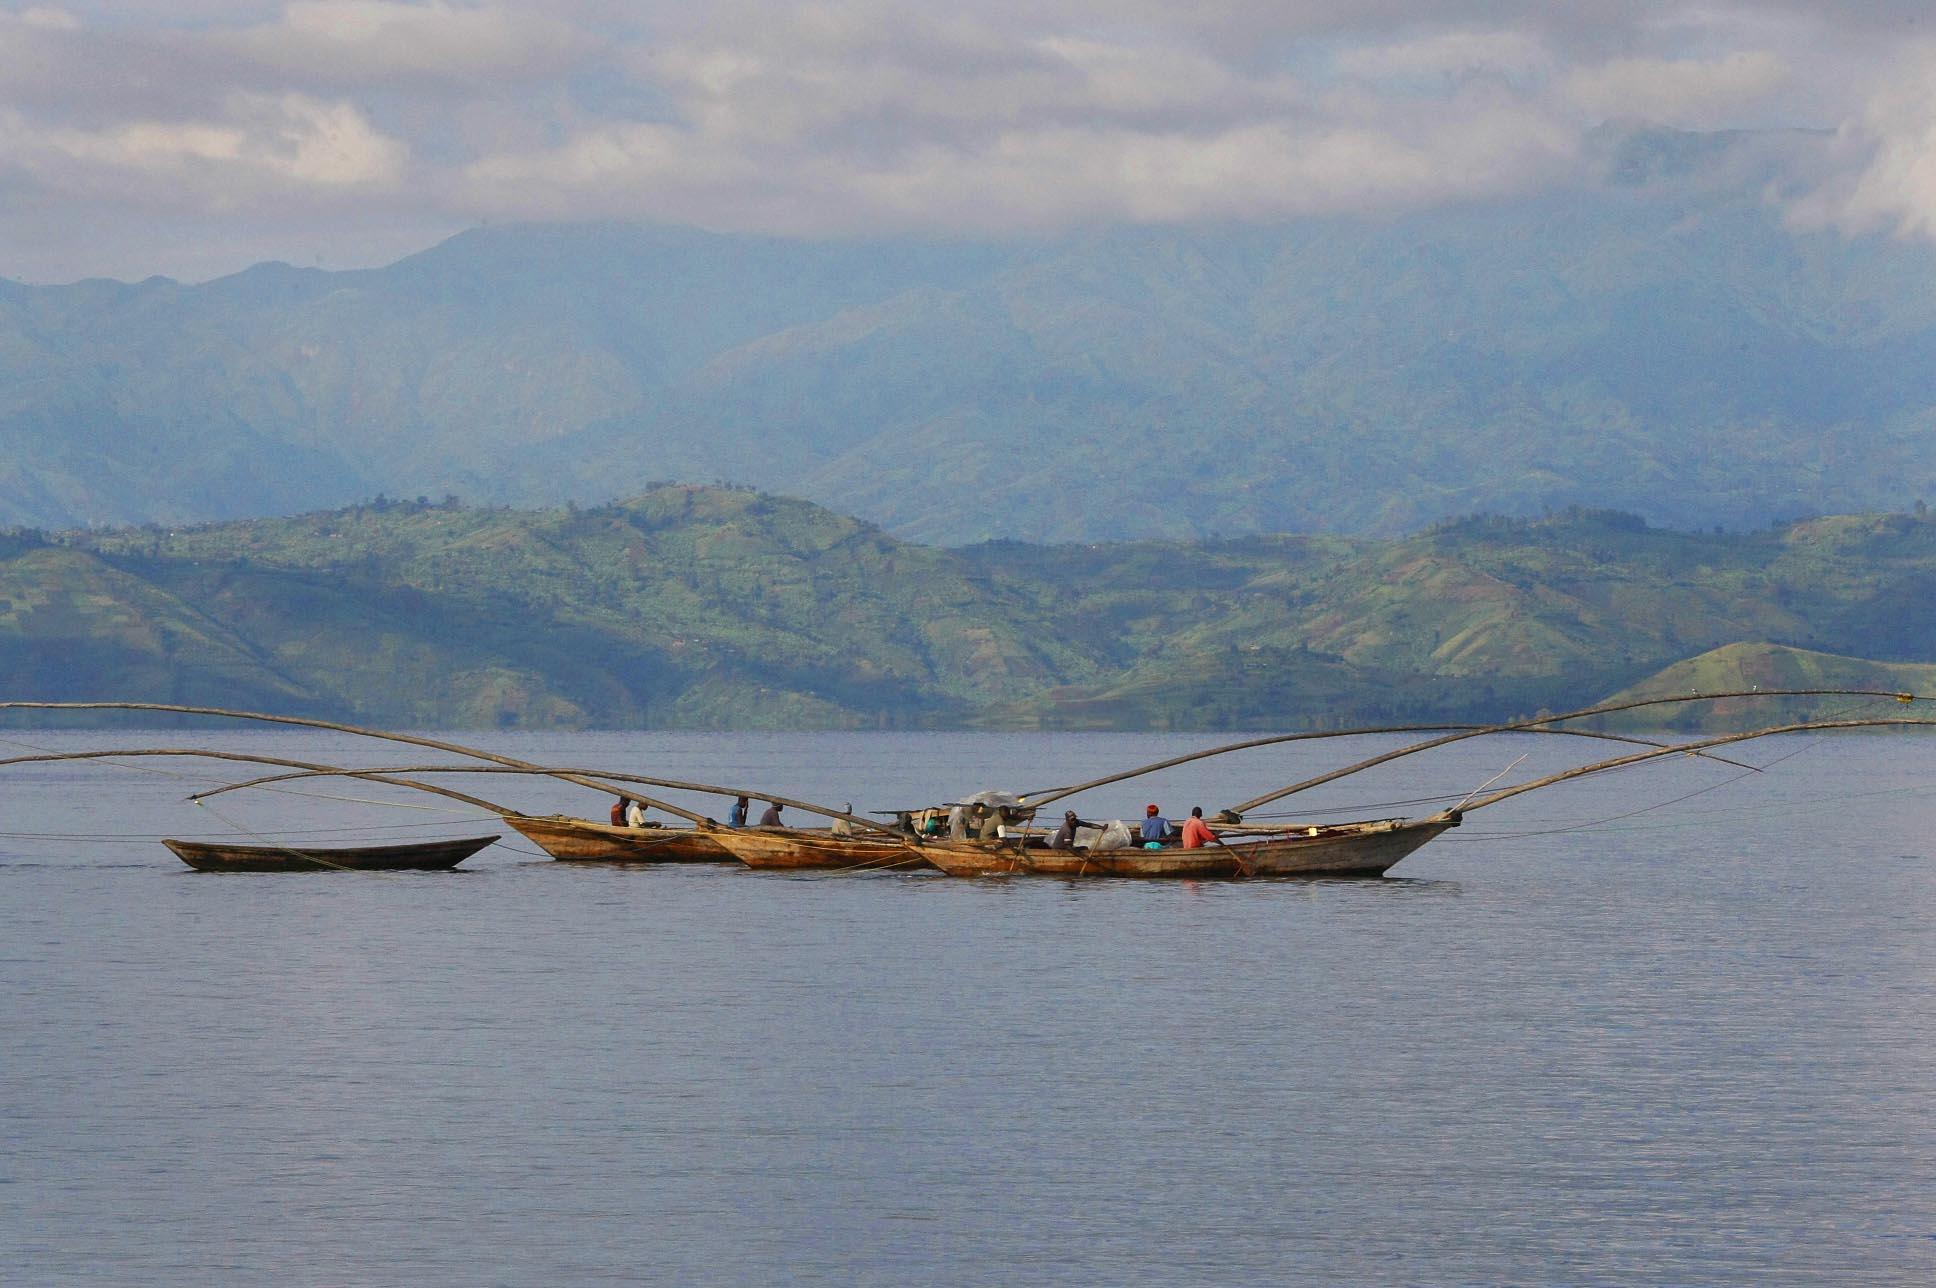 Lake_Kivu_boats.jpg